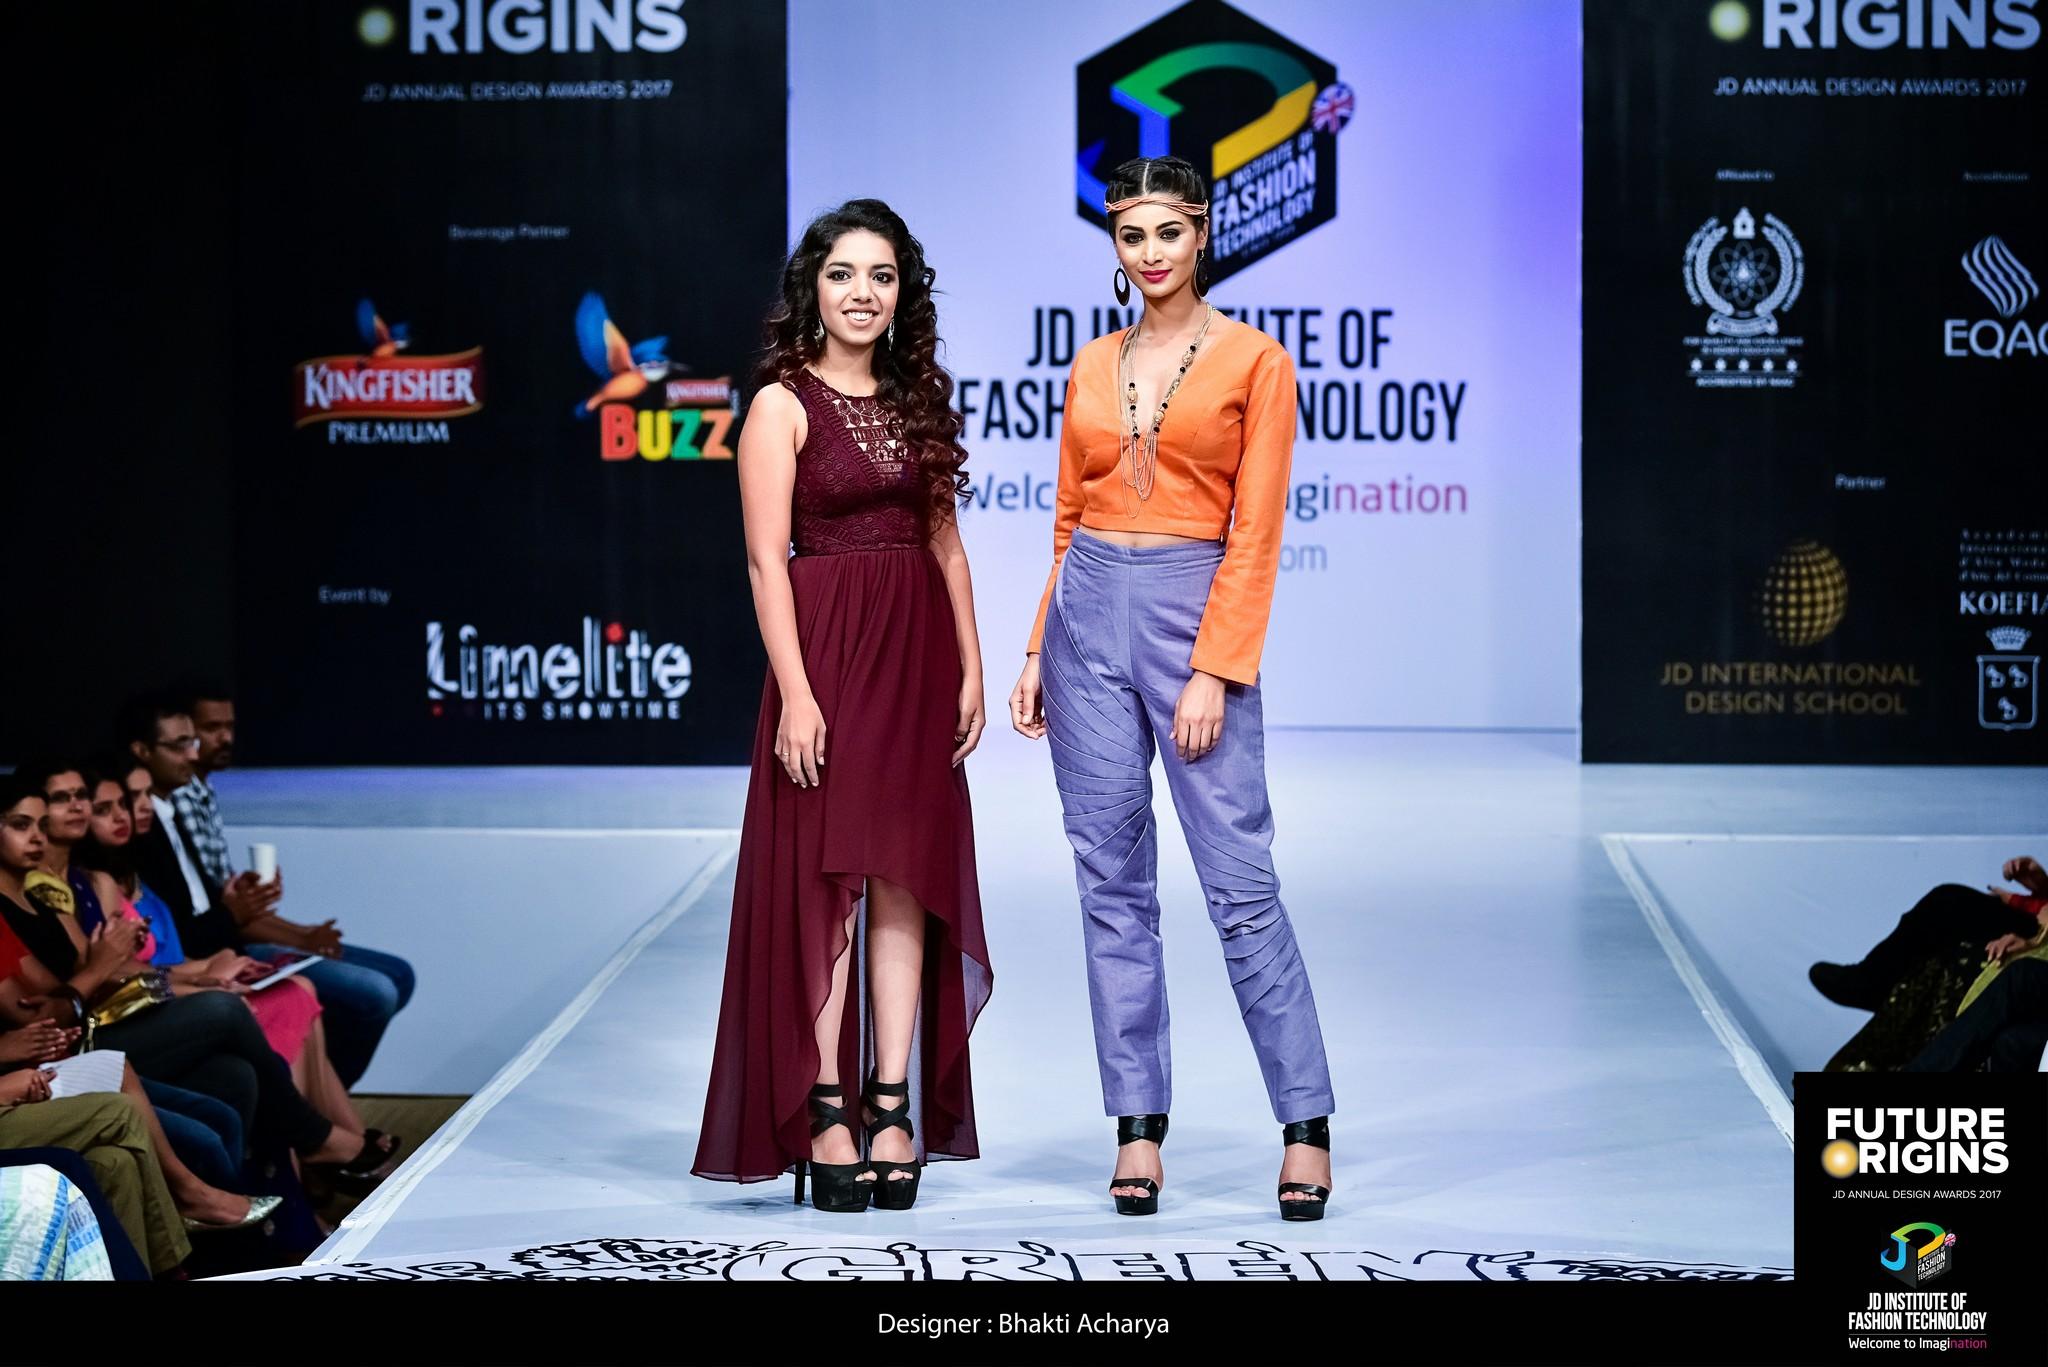 De Novo - Future Origin - JD Annual Design Awards 2017 | Photography : Jerin Nath (@jerin_nath) de novo - future origin - jd annual design awards 2017 - De Novo     Future Origin     JD Annual Design Awards 2017 5 - De Novo – Future Origin – JD Annual Design Awards 2017